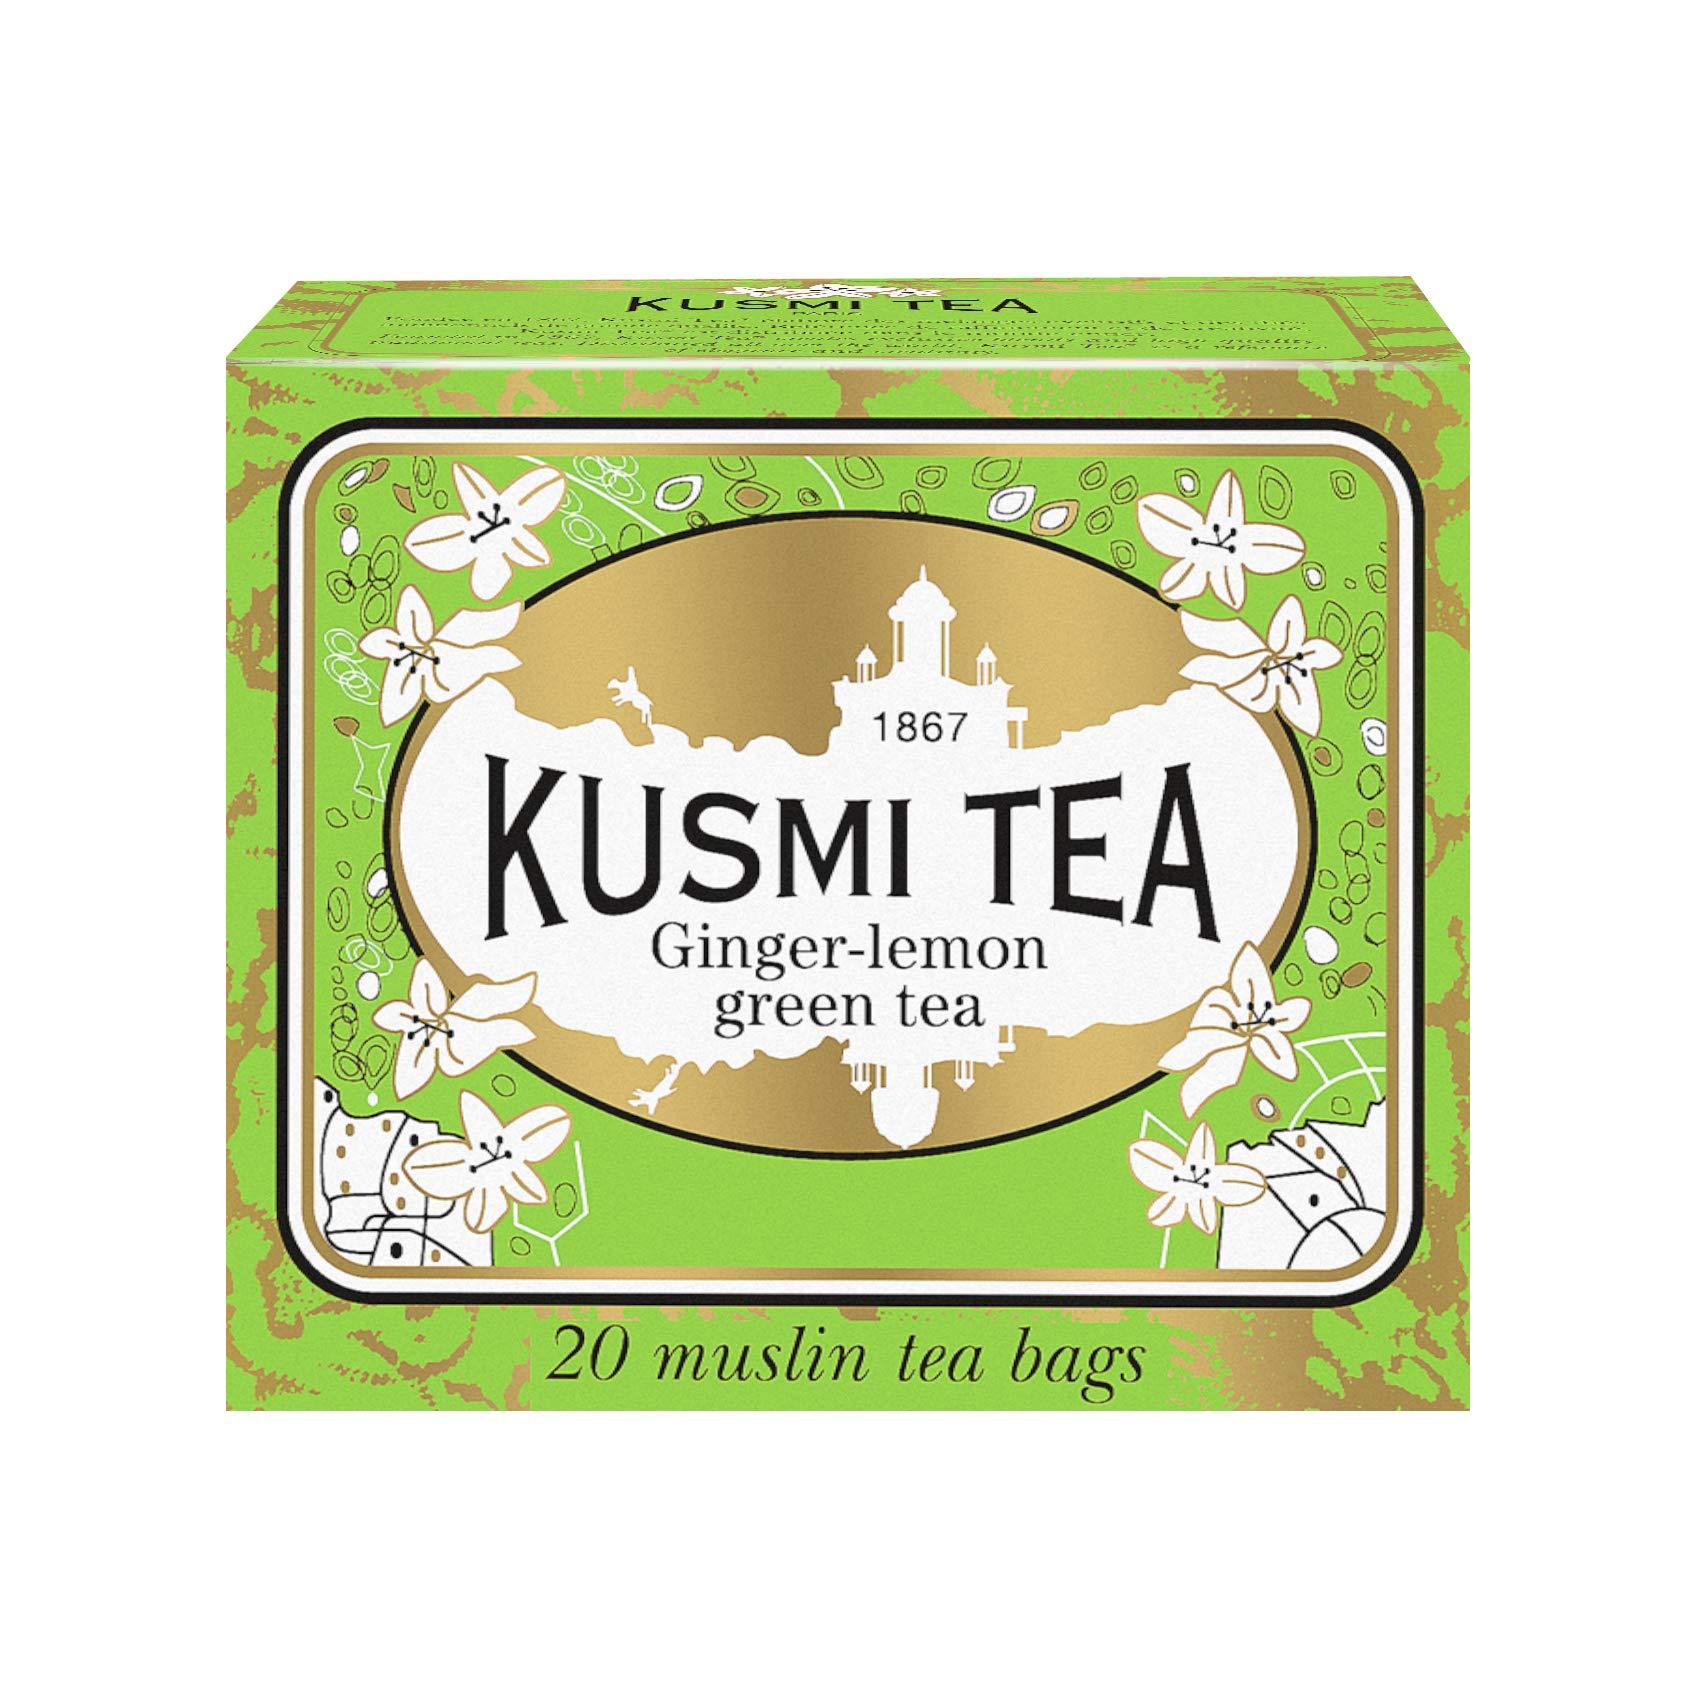 Kusmi Tea - Ginger Lemon Green Tea - Refreshing Green Tea Blend flavored with Lemon Scent and Ginger - All Natural, Premium Loose Leaf Green Tea in 20 Eco-Friendly Muslin Tea Bags